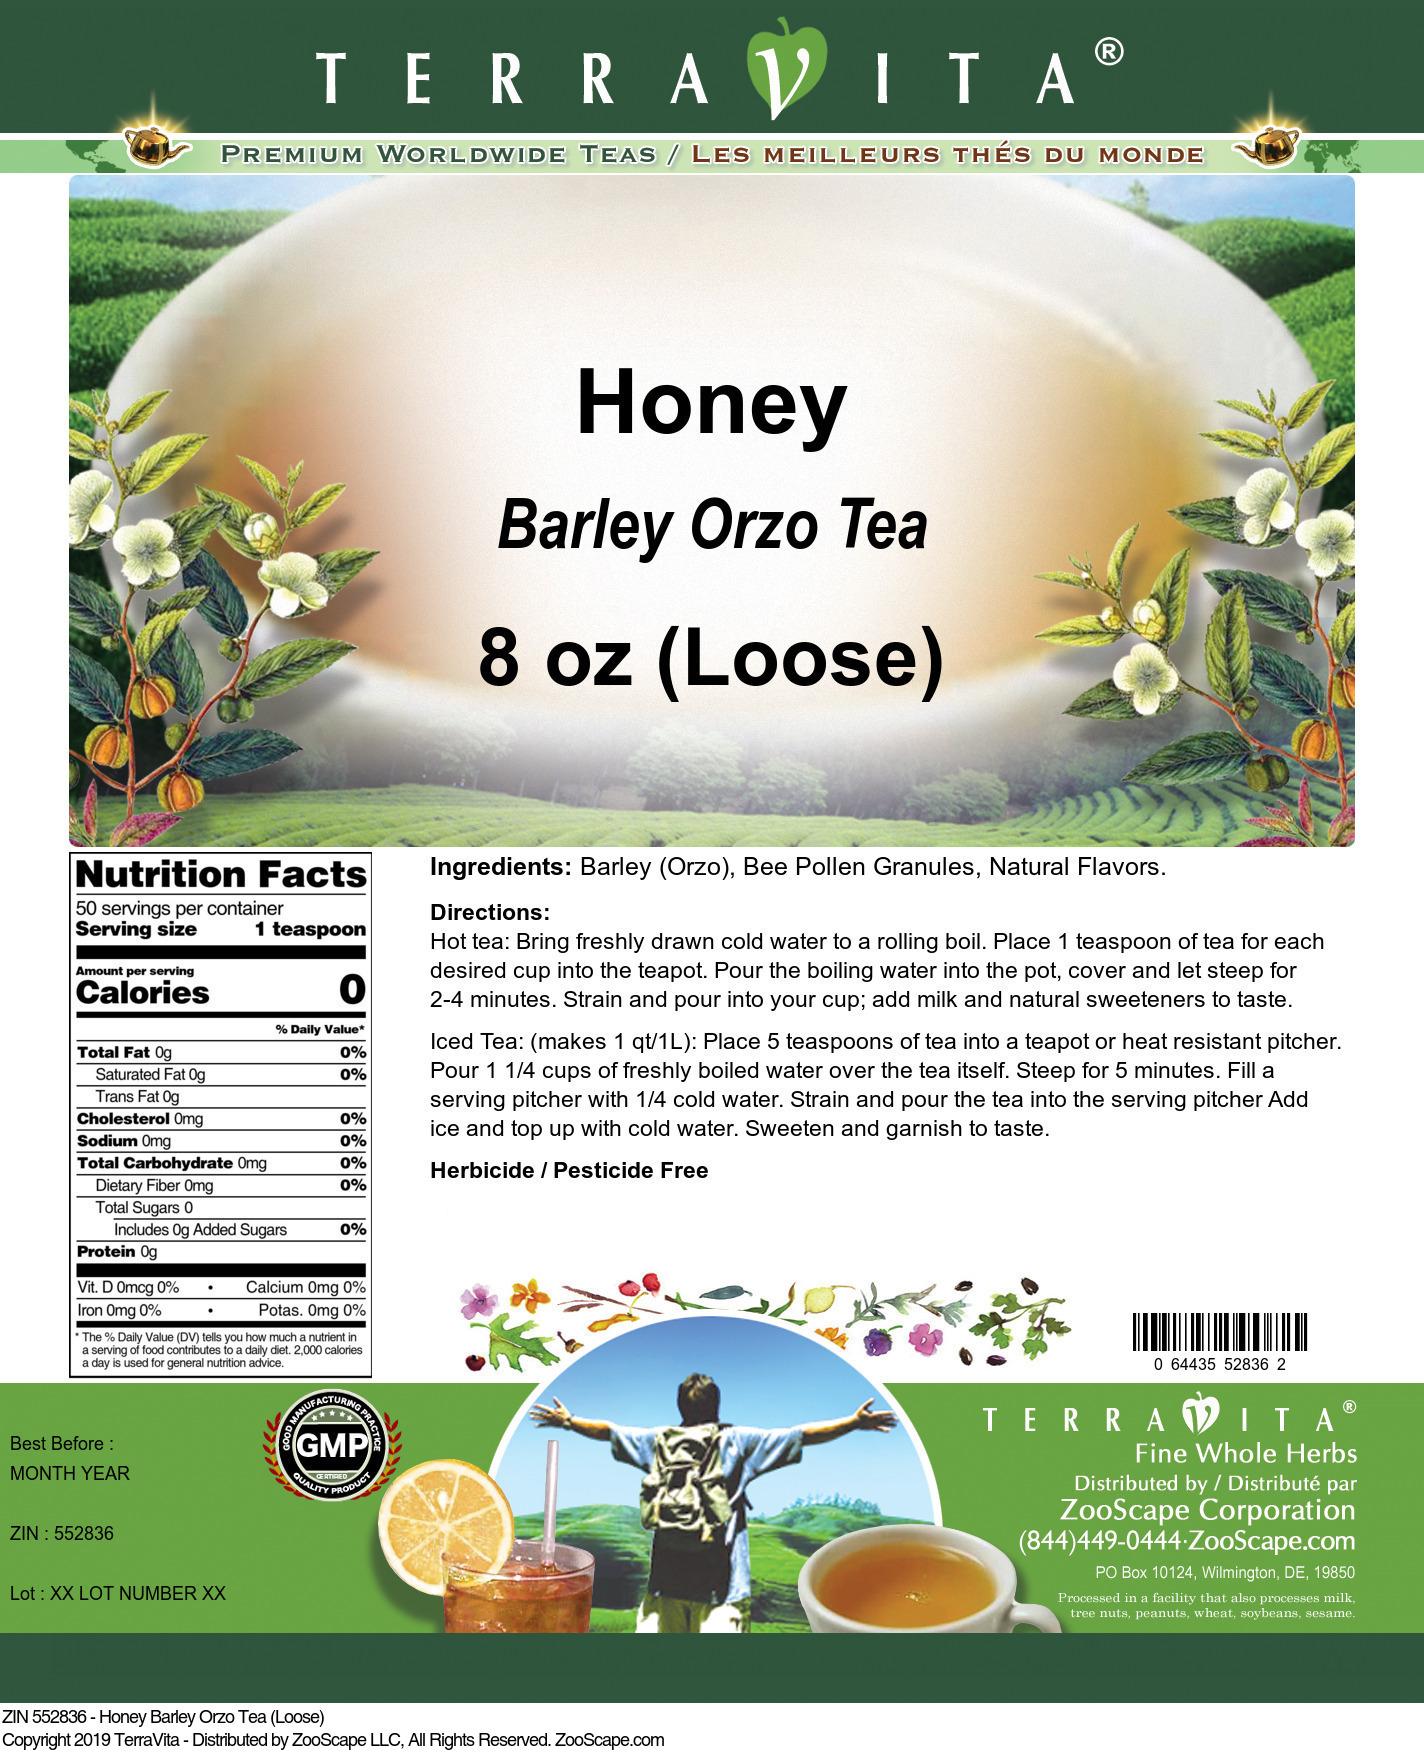 Honey Barley Orzo